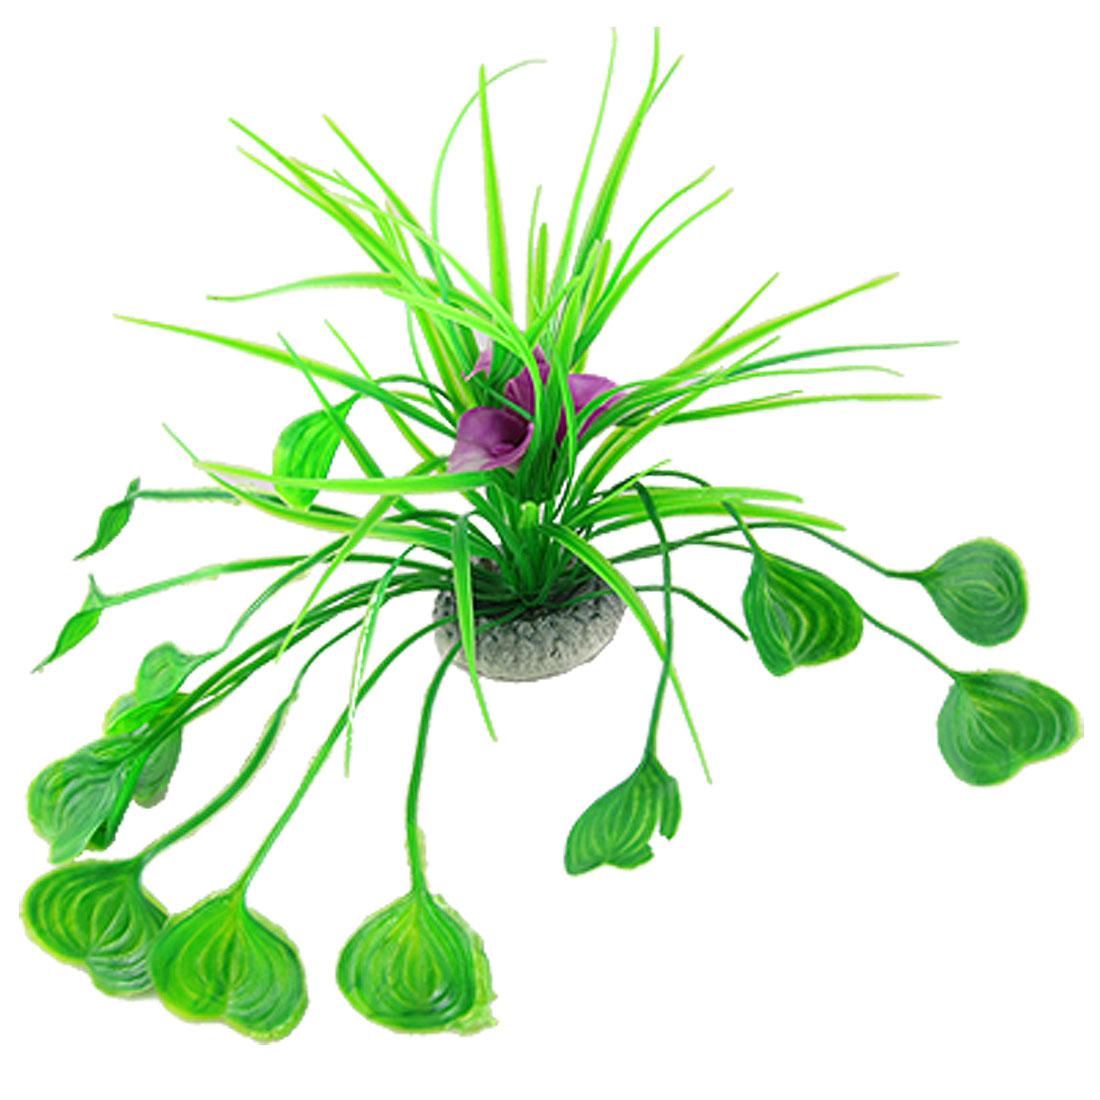 Aquarium Plastic Green Heart Shaped Leaf Purple Flower Accent Plants Decor